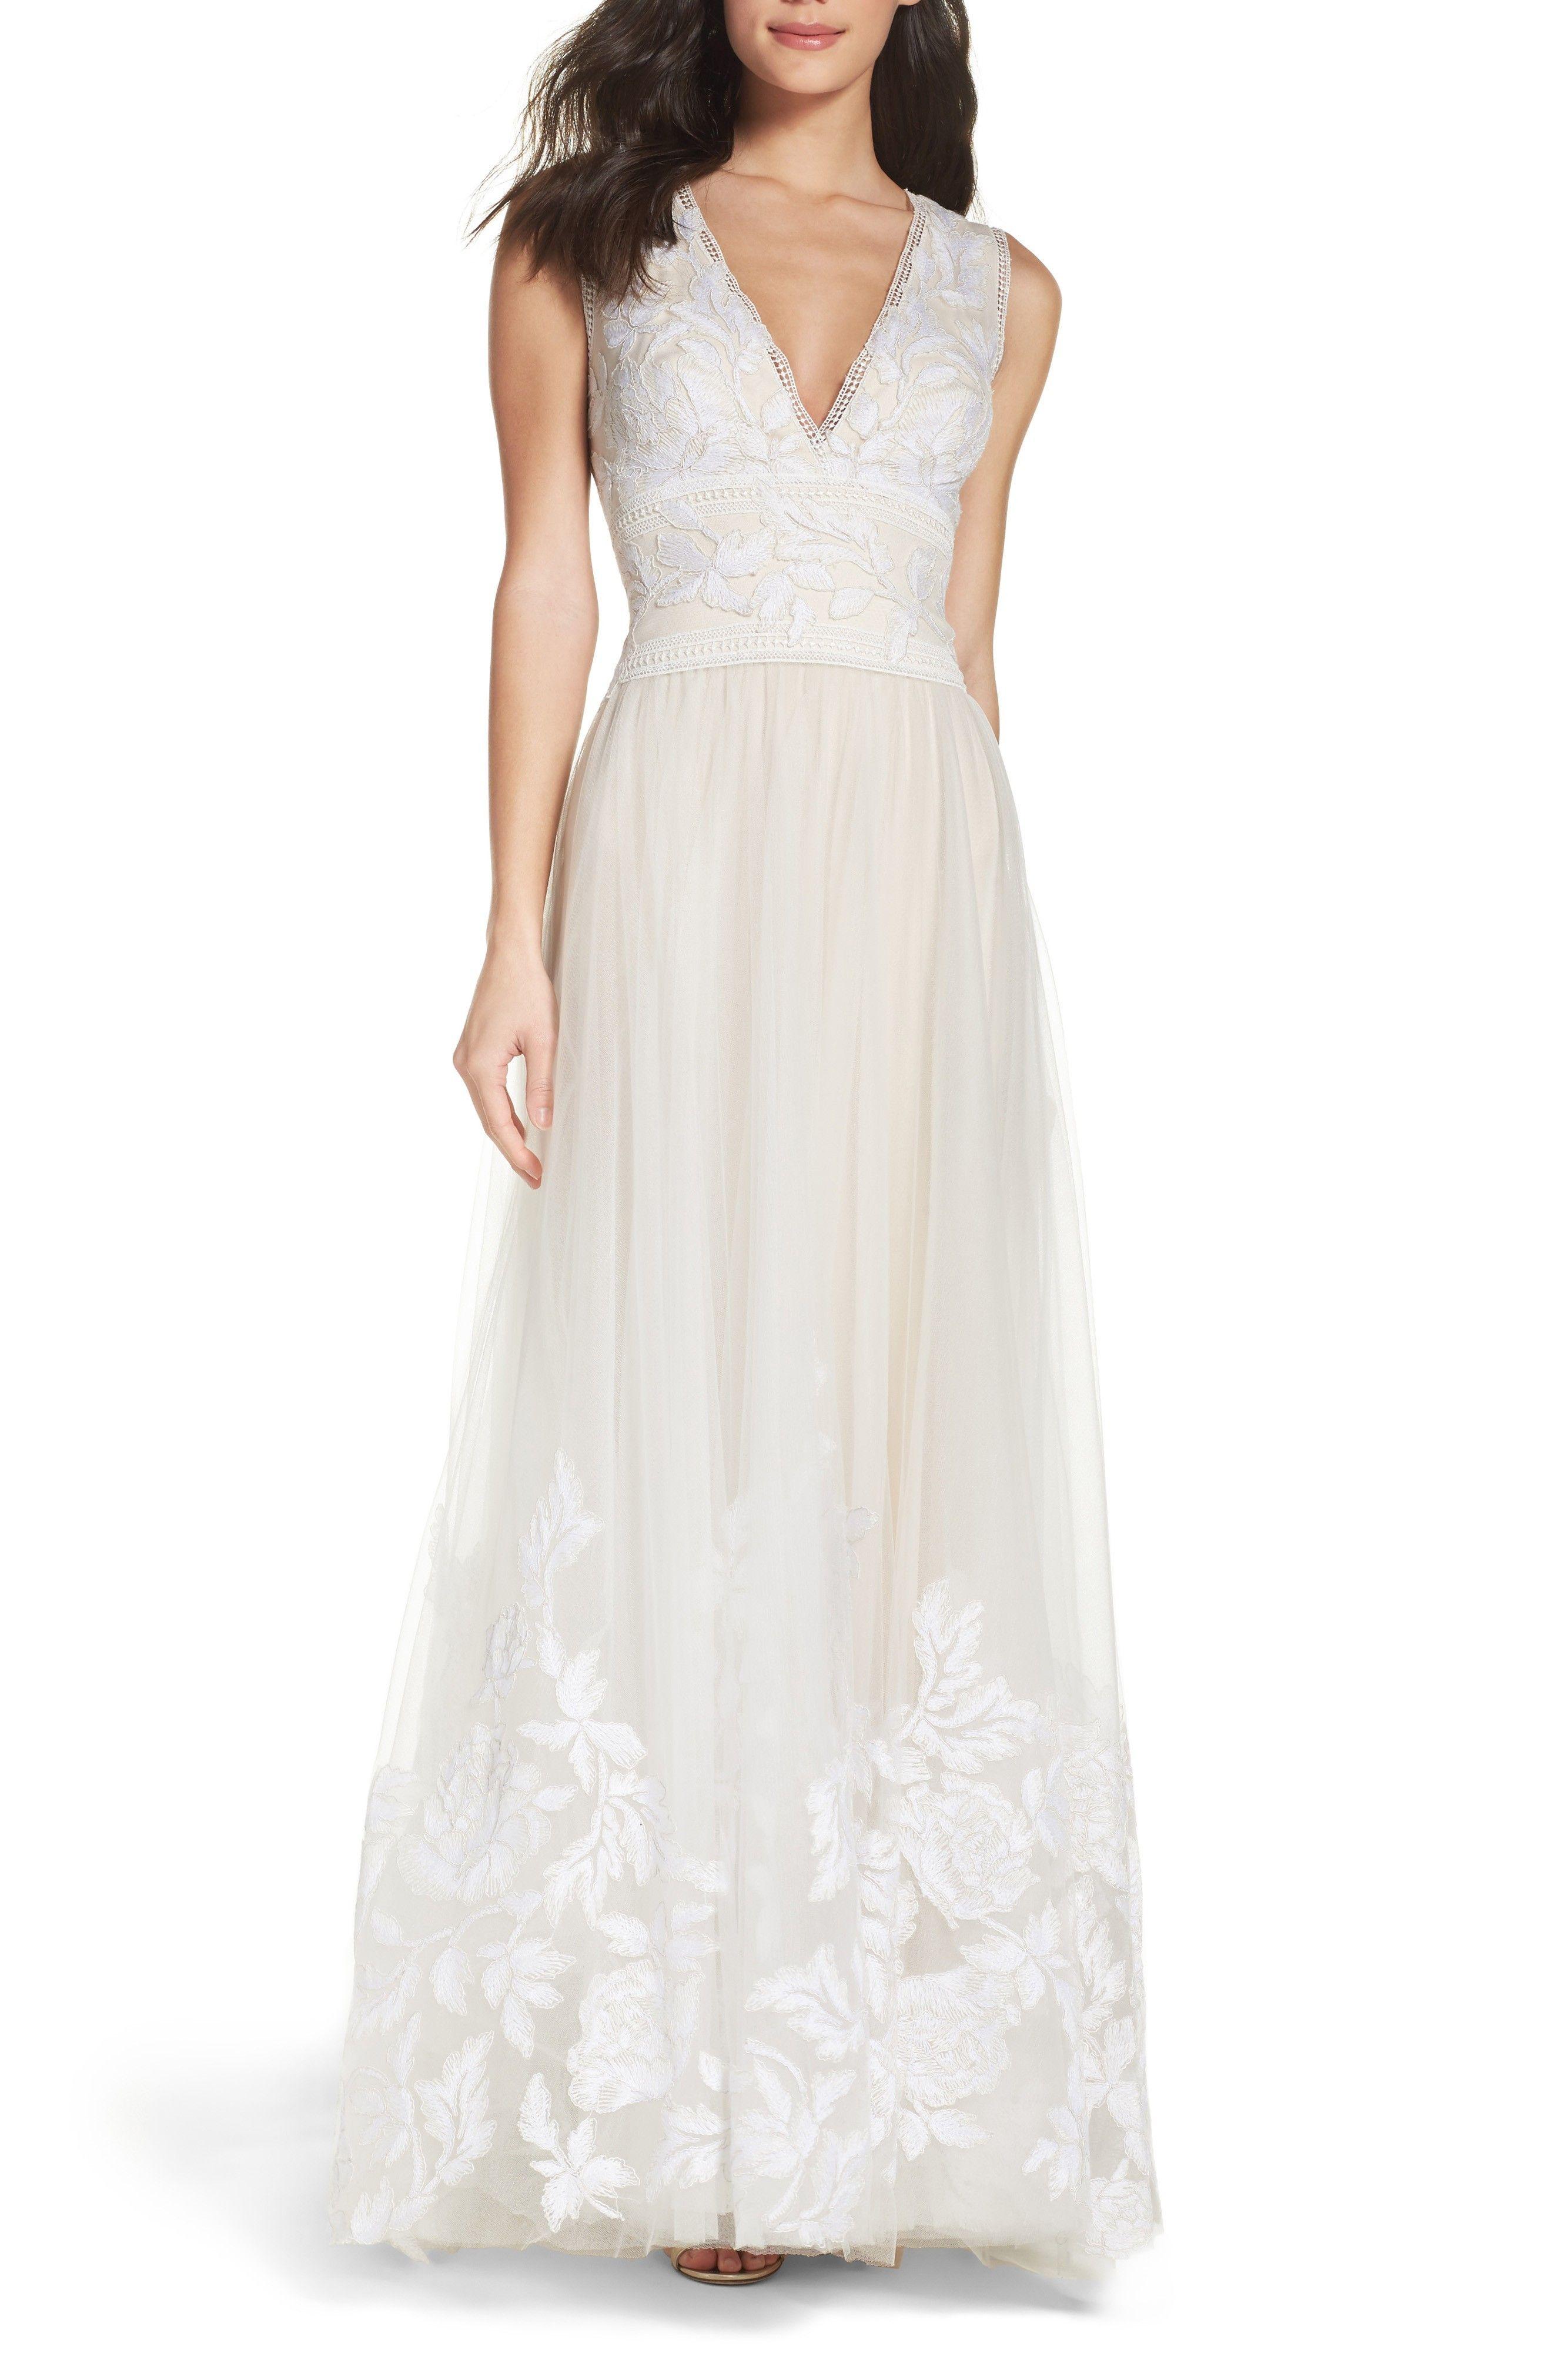 Tulle Lace A-Line Tadashi Shoji Bridal Gown || Budget Friendly ...